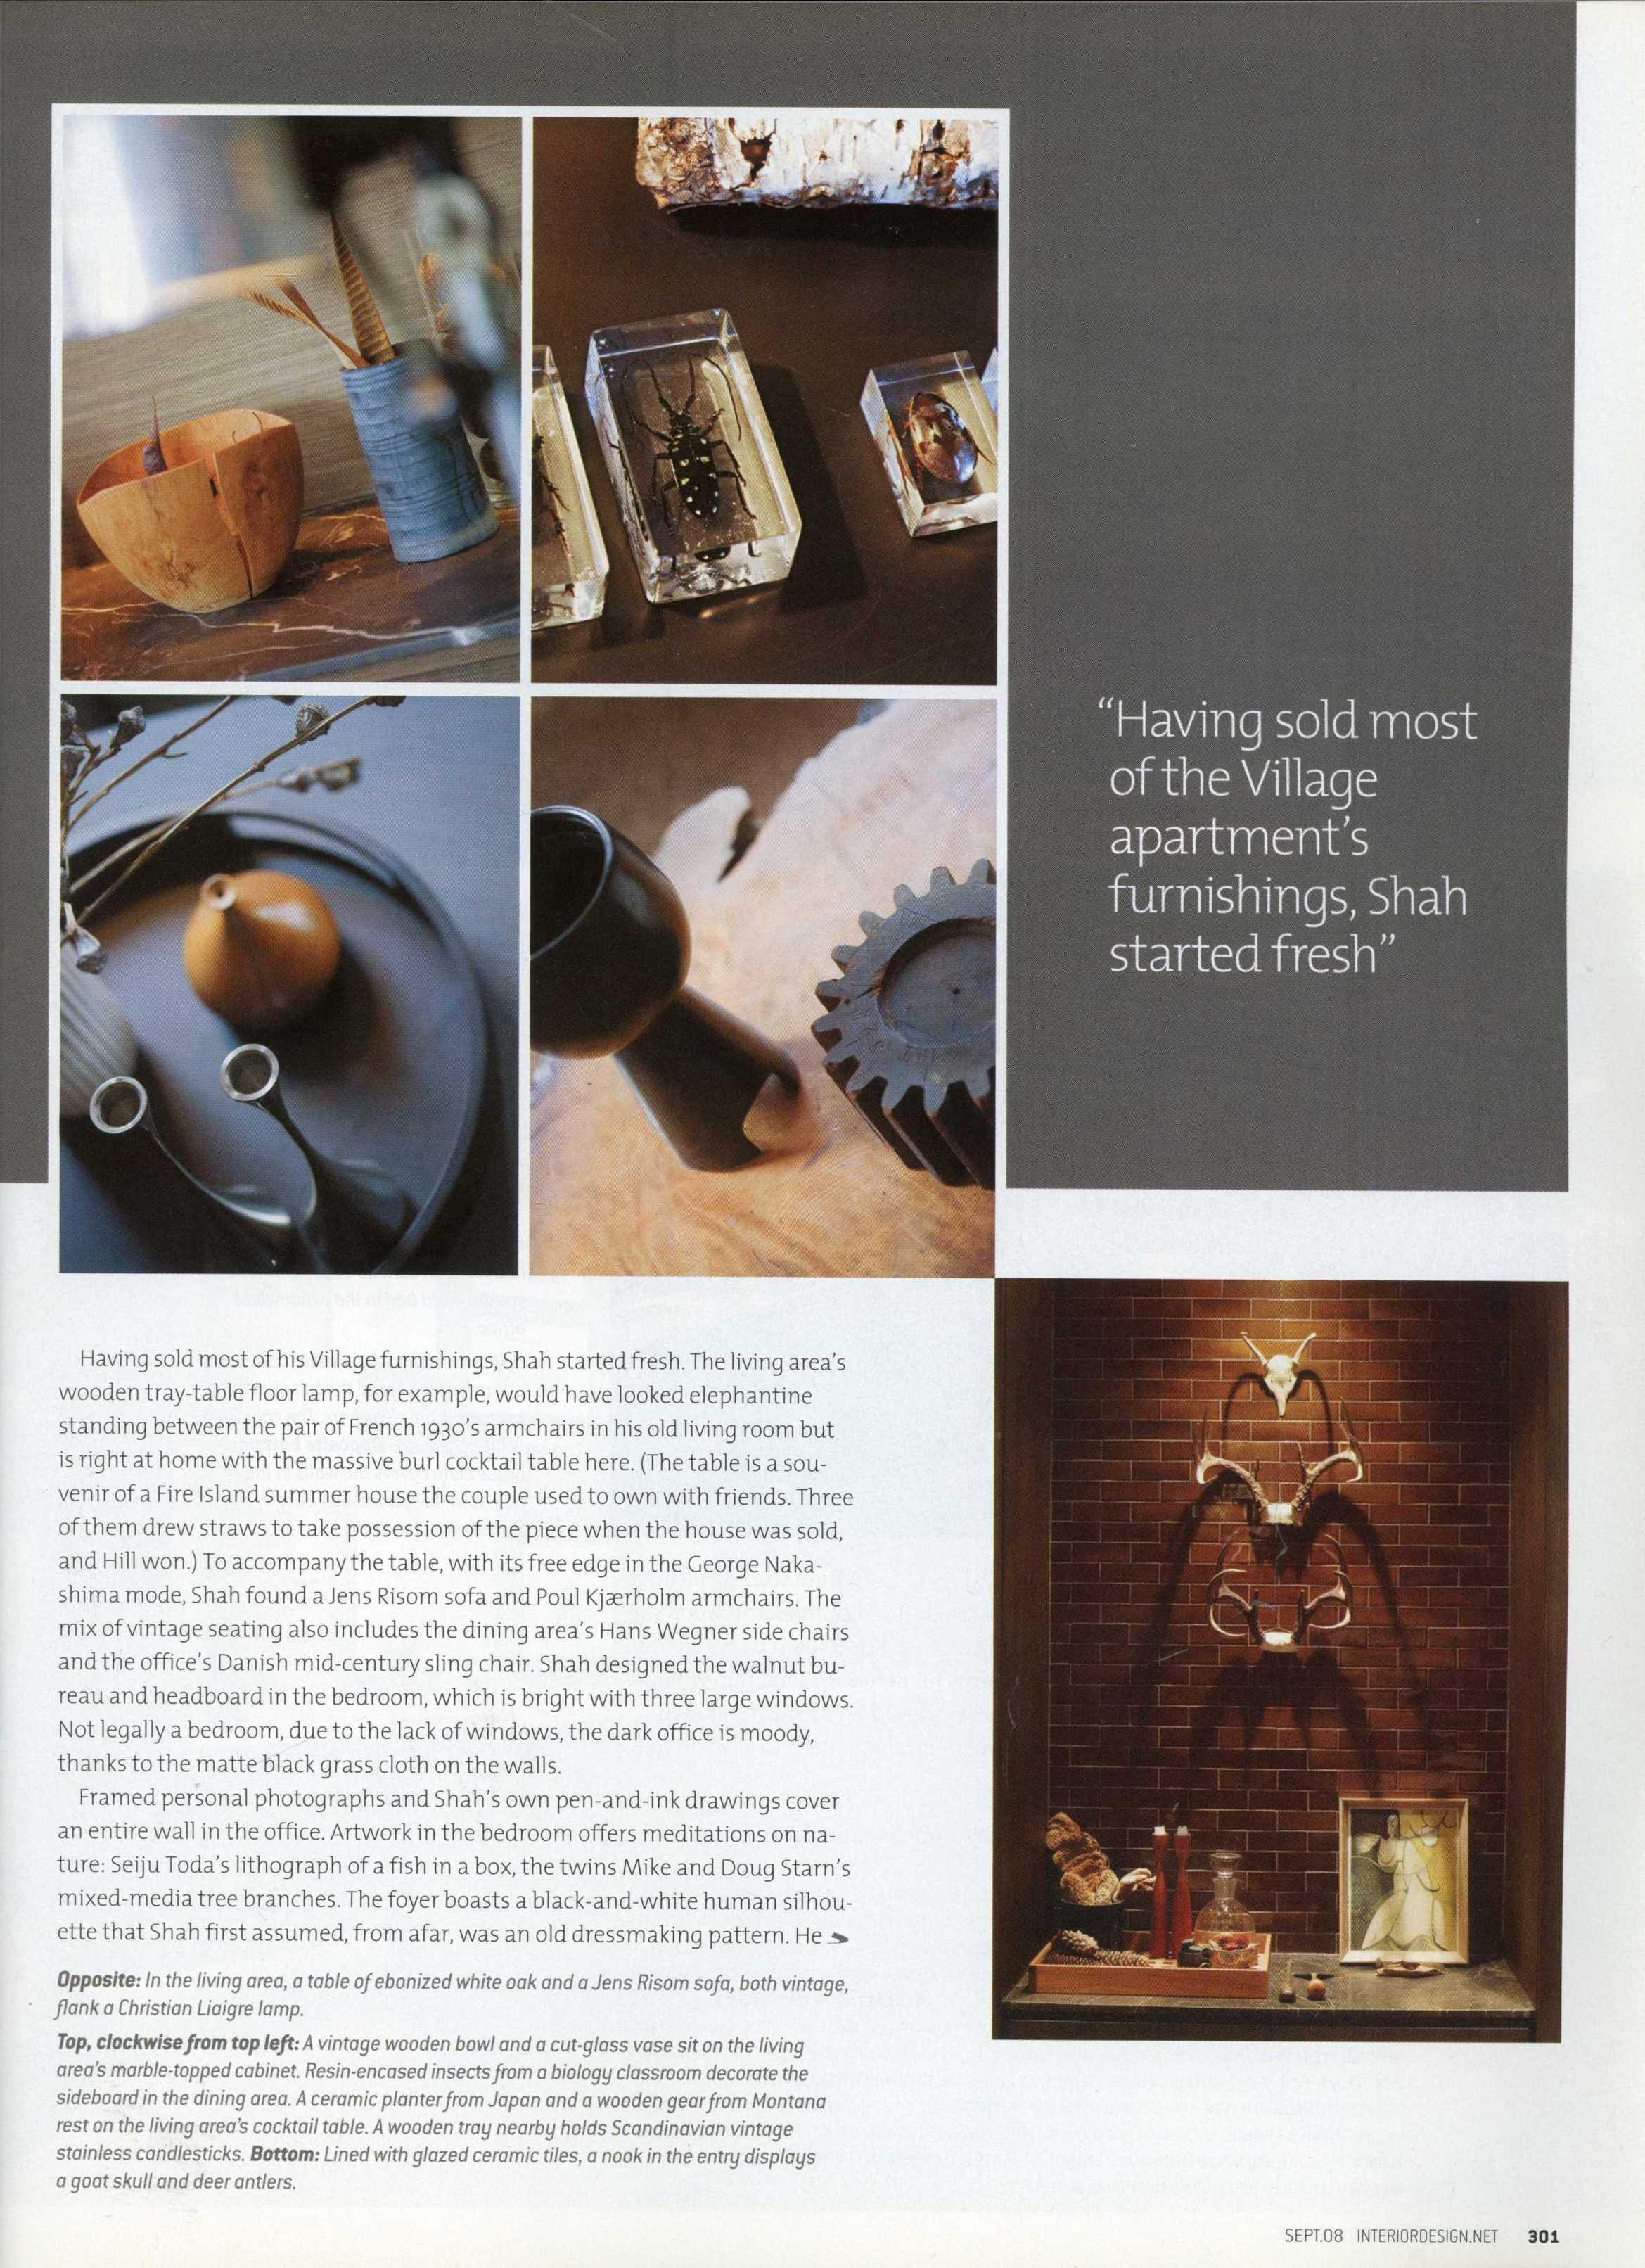 Interior Design_Sept 08_SS Apt_Full Article_Page_7.jpg